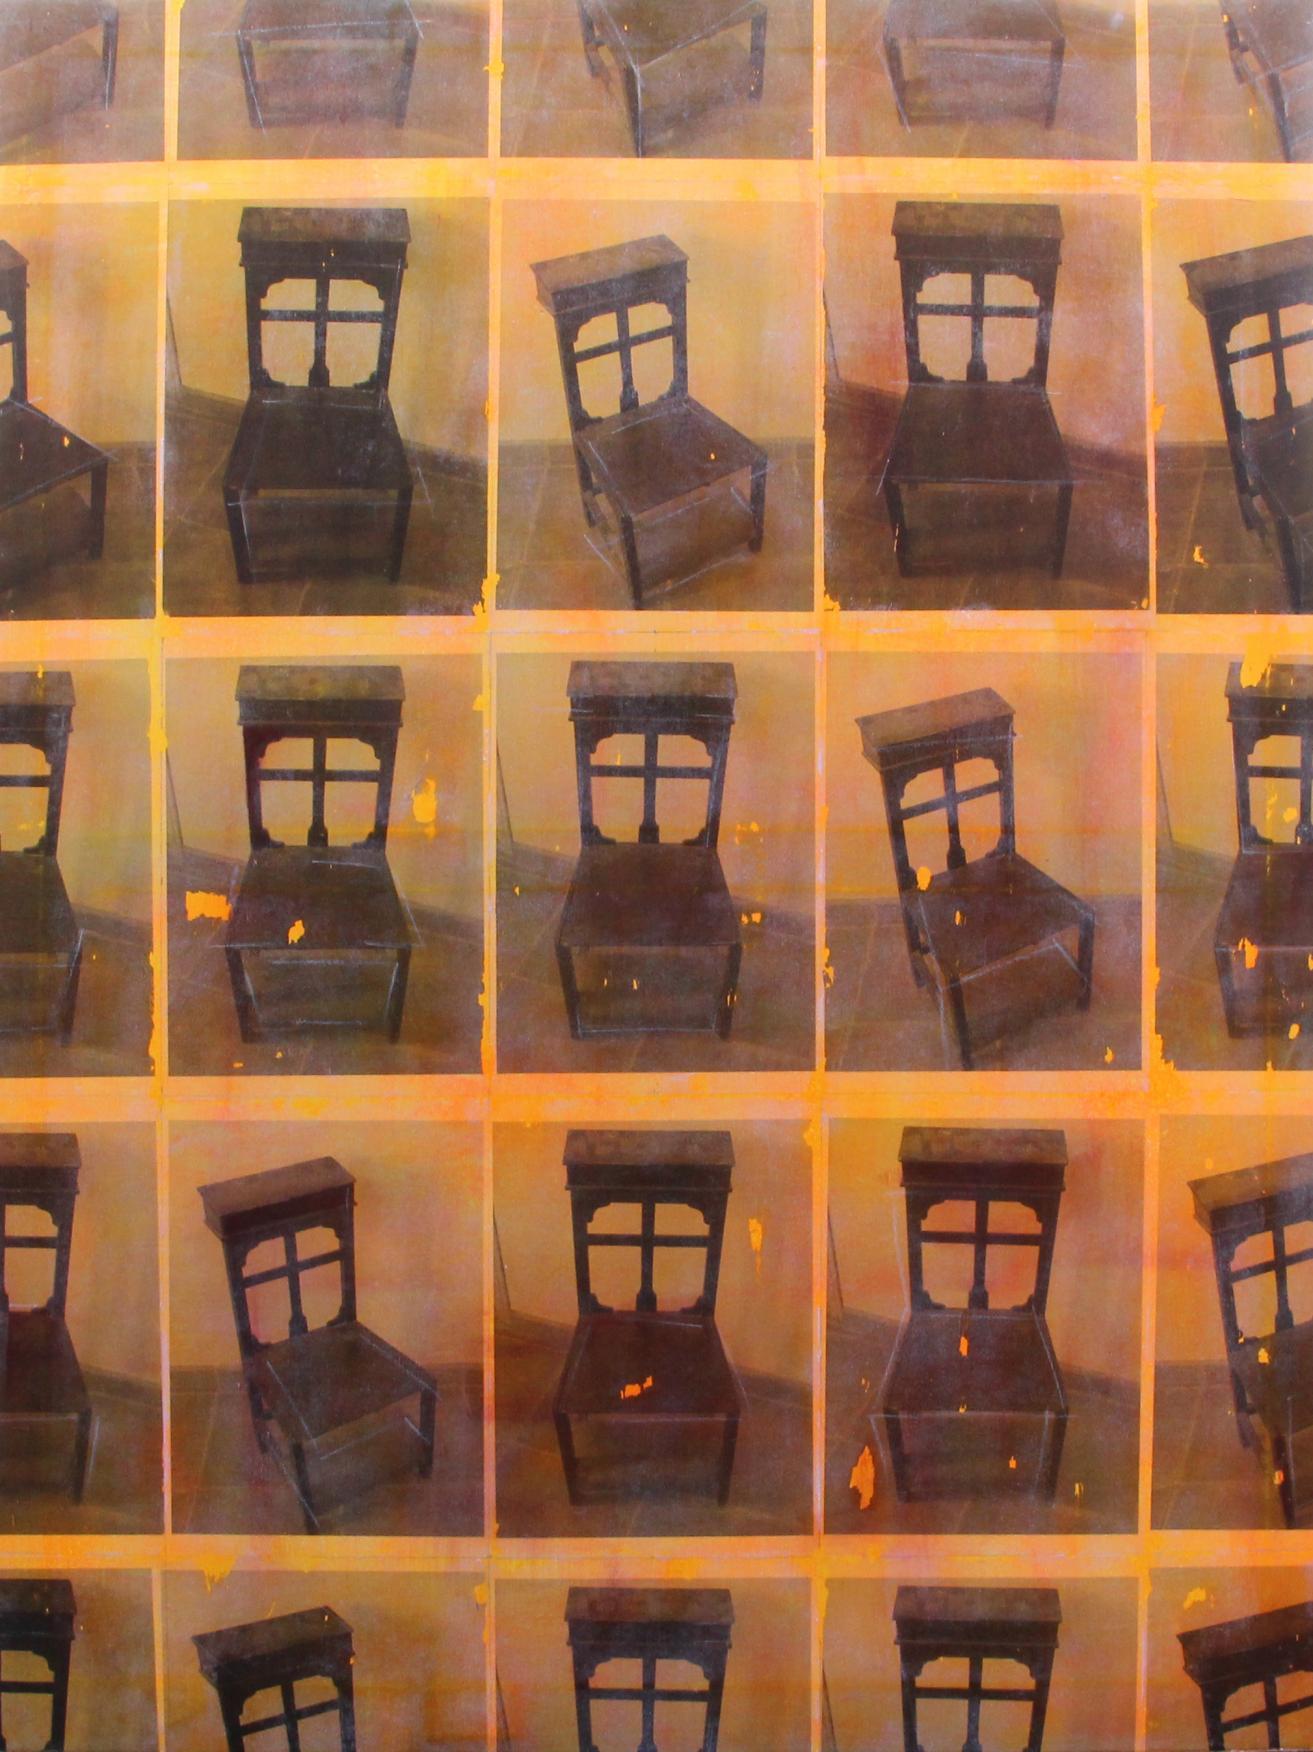 Homenaje a la silla eléctrica (2017) - Pepe Jiménez Espejo